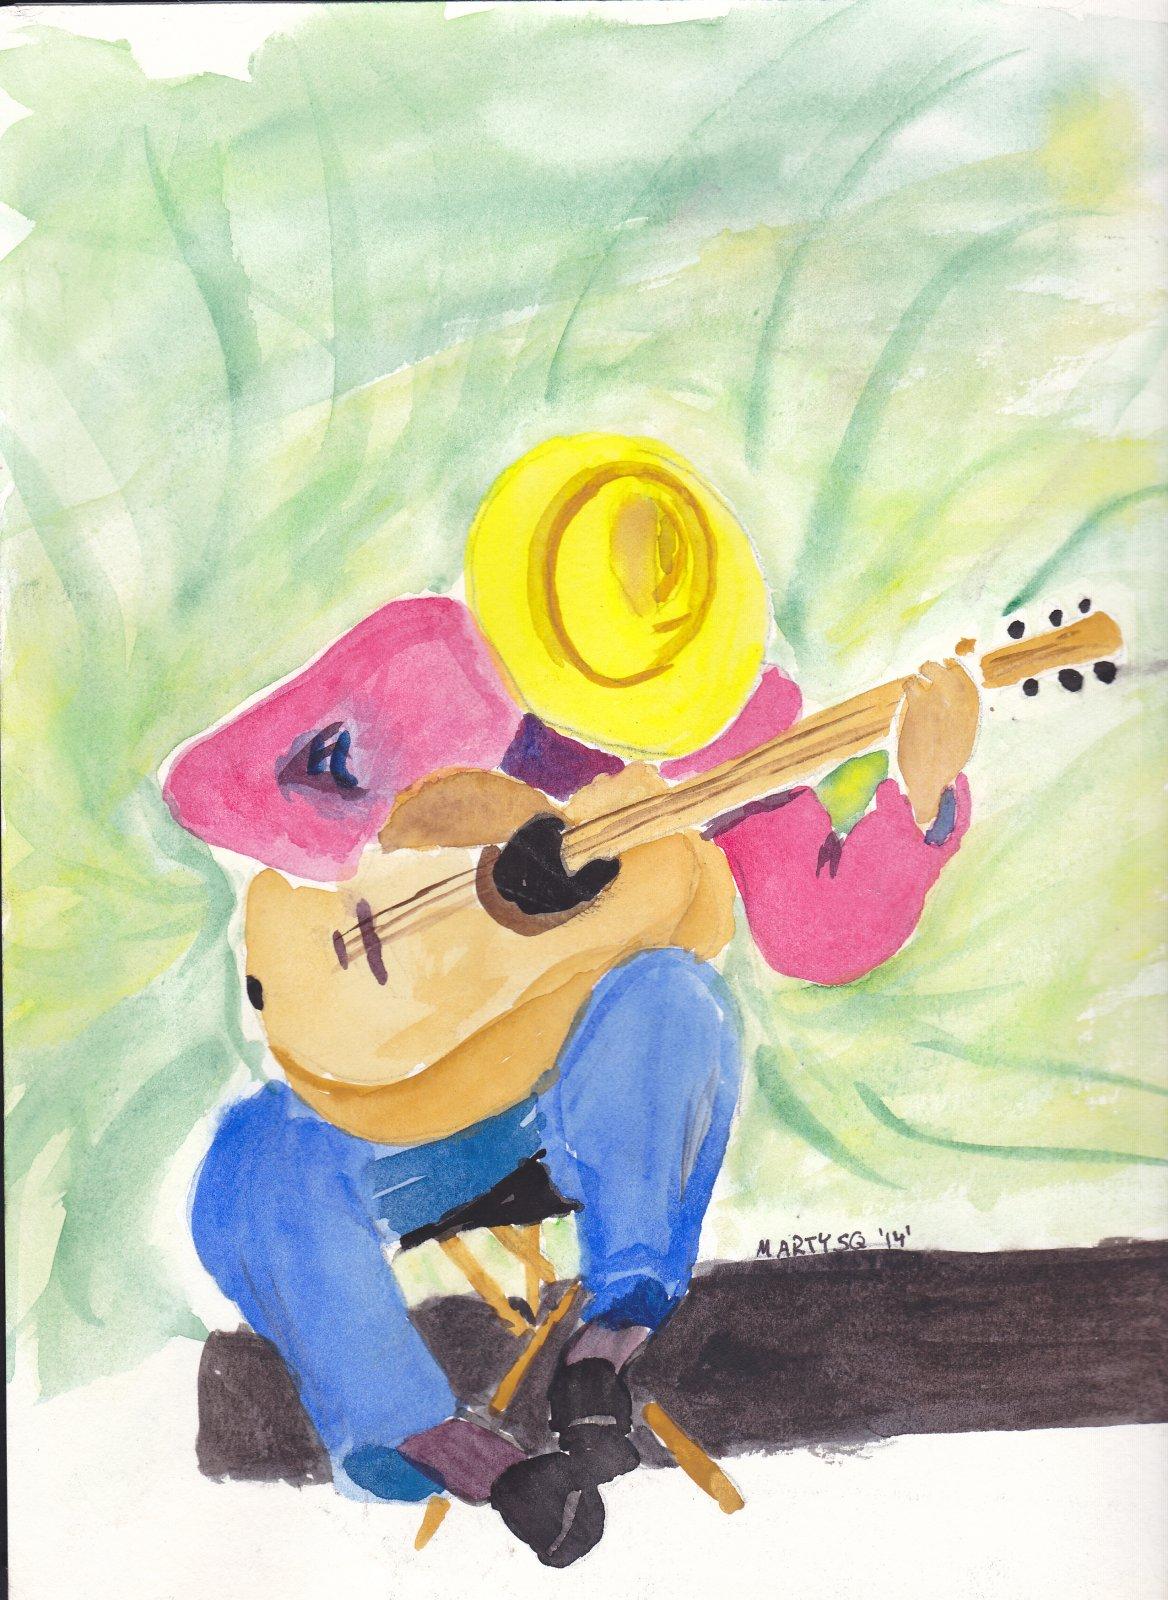 Click image for larger version  Name:Banjo man.jpg Views:27 Size:330.2 KB ID:62458